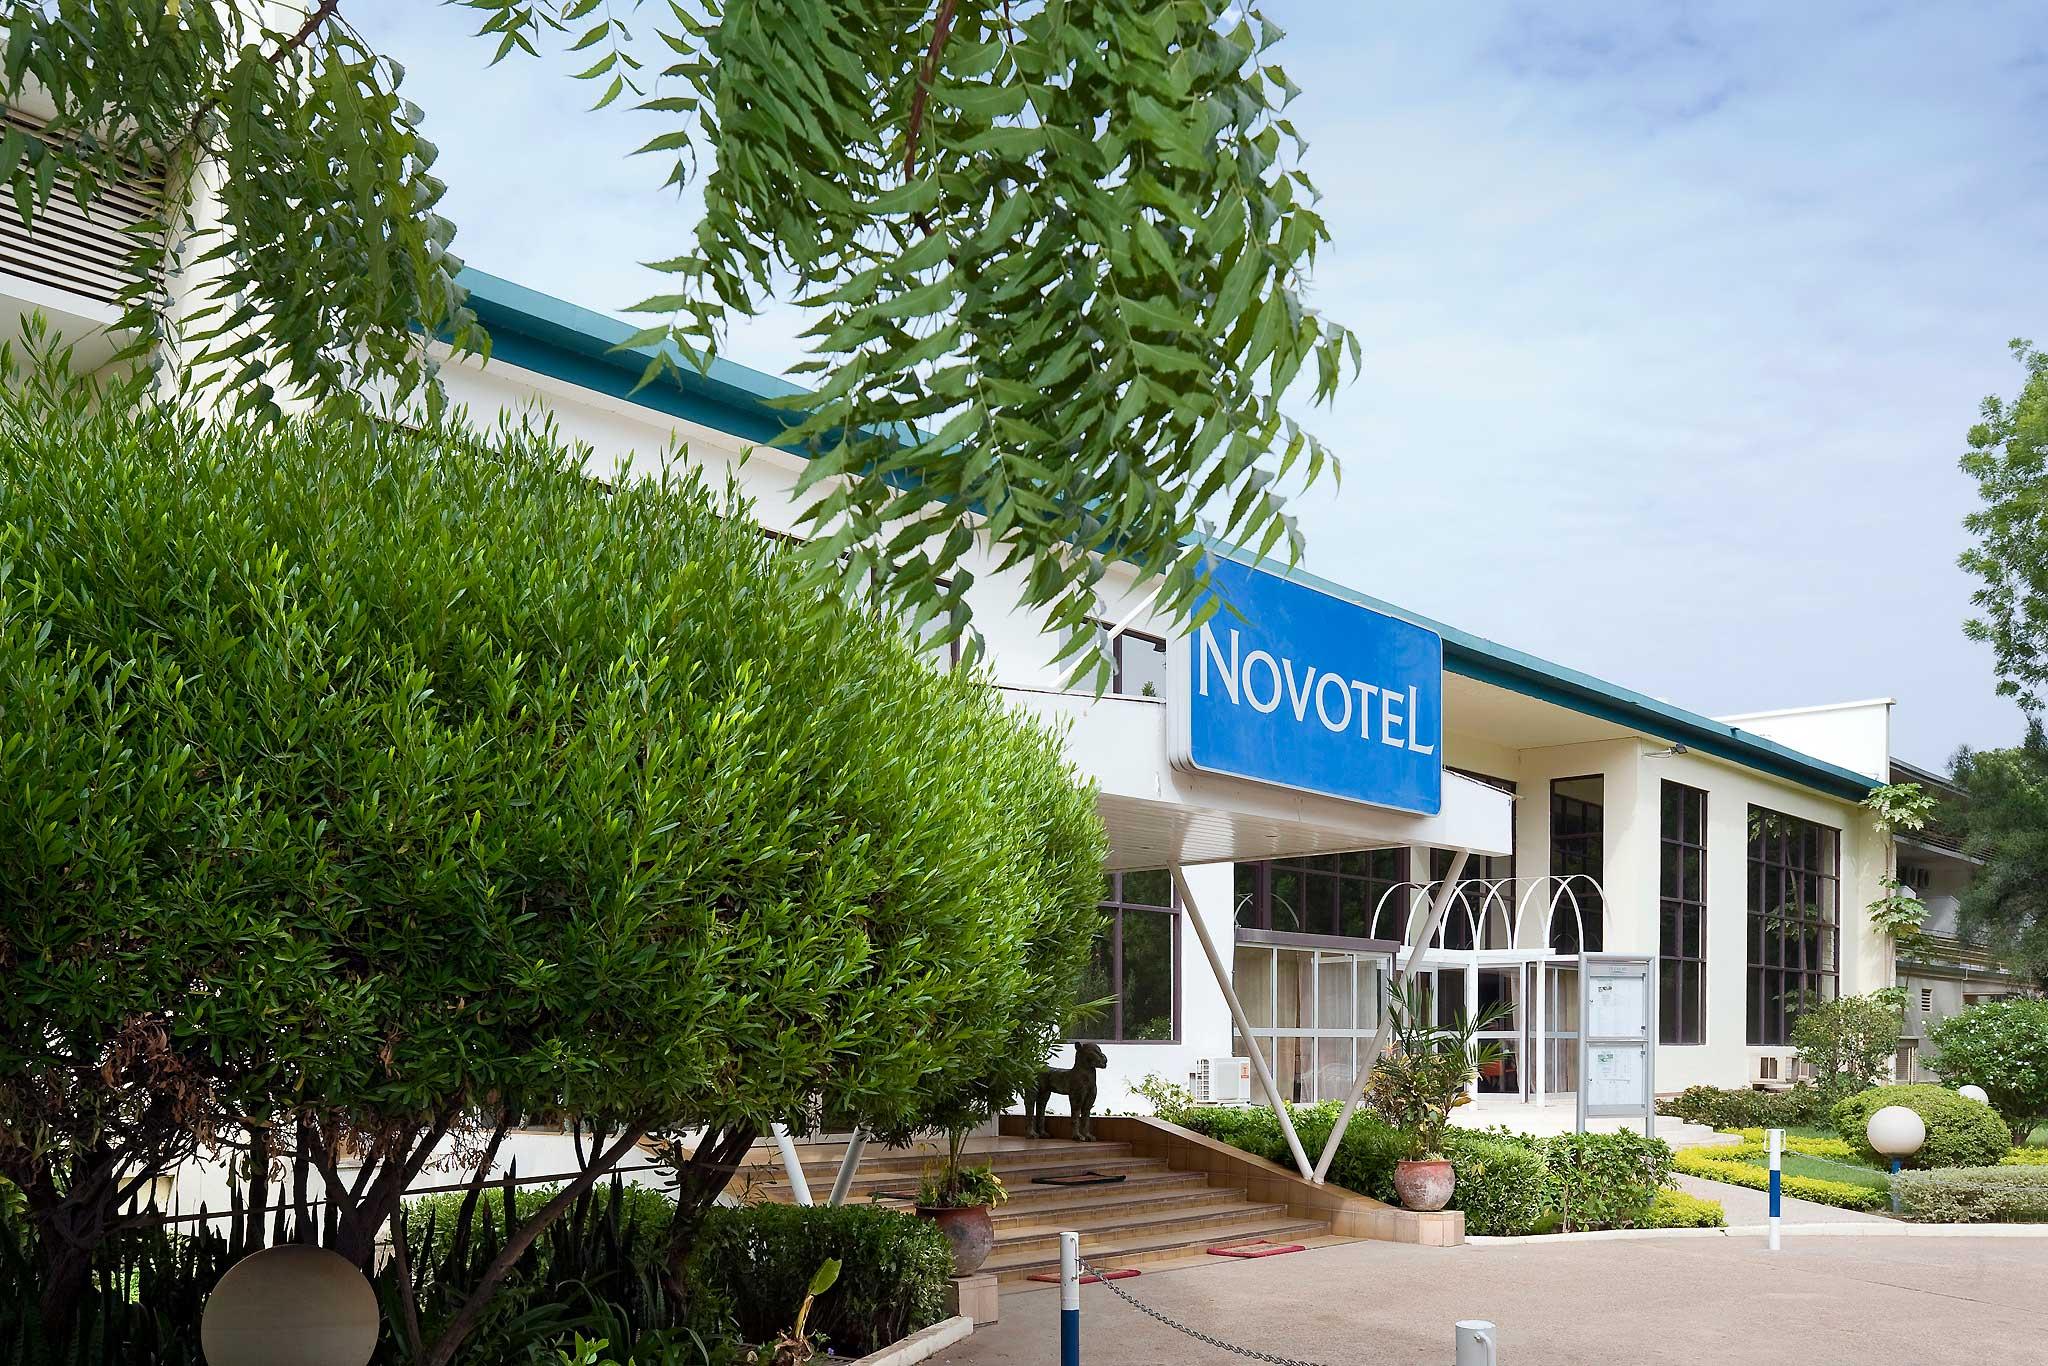 فندق - Novotel N'Djaména La Tchadienne